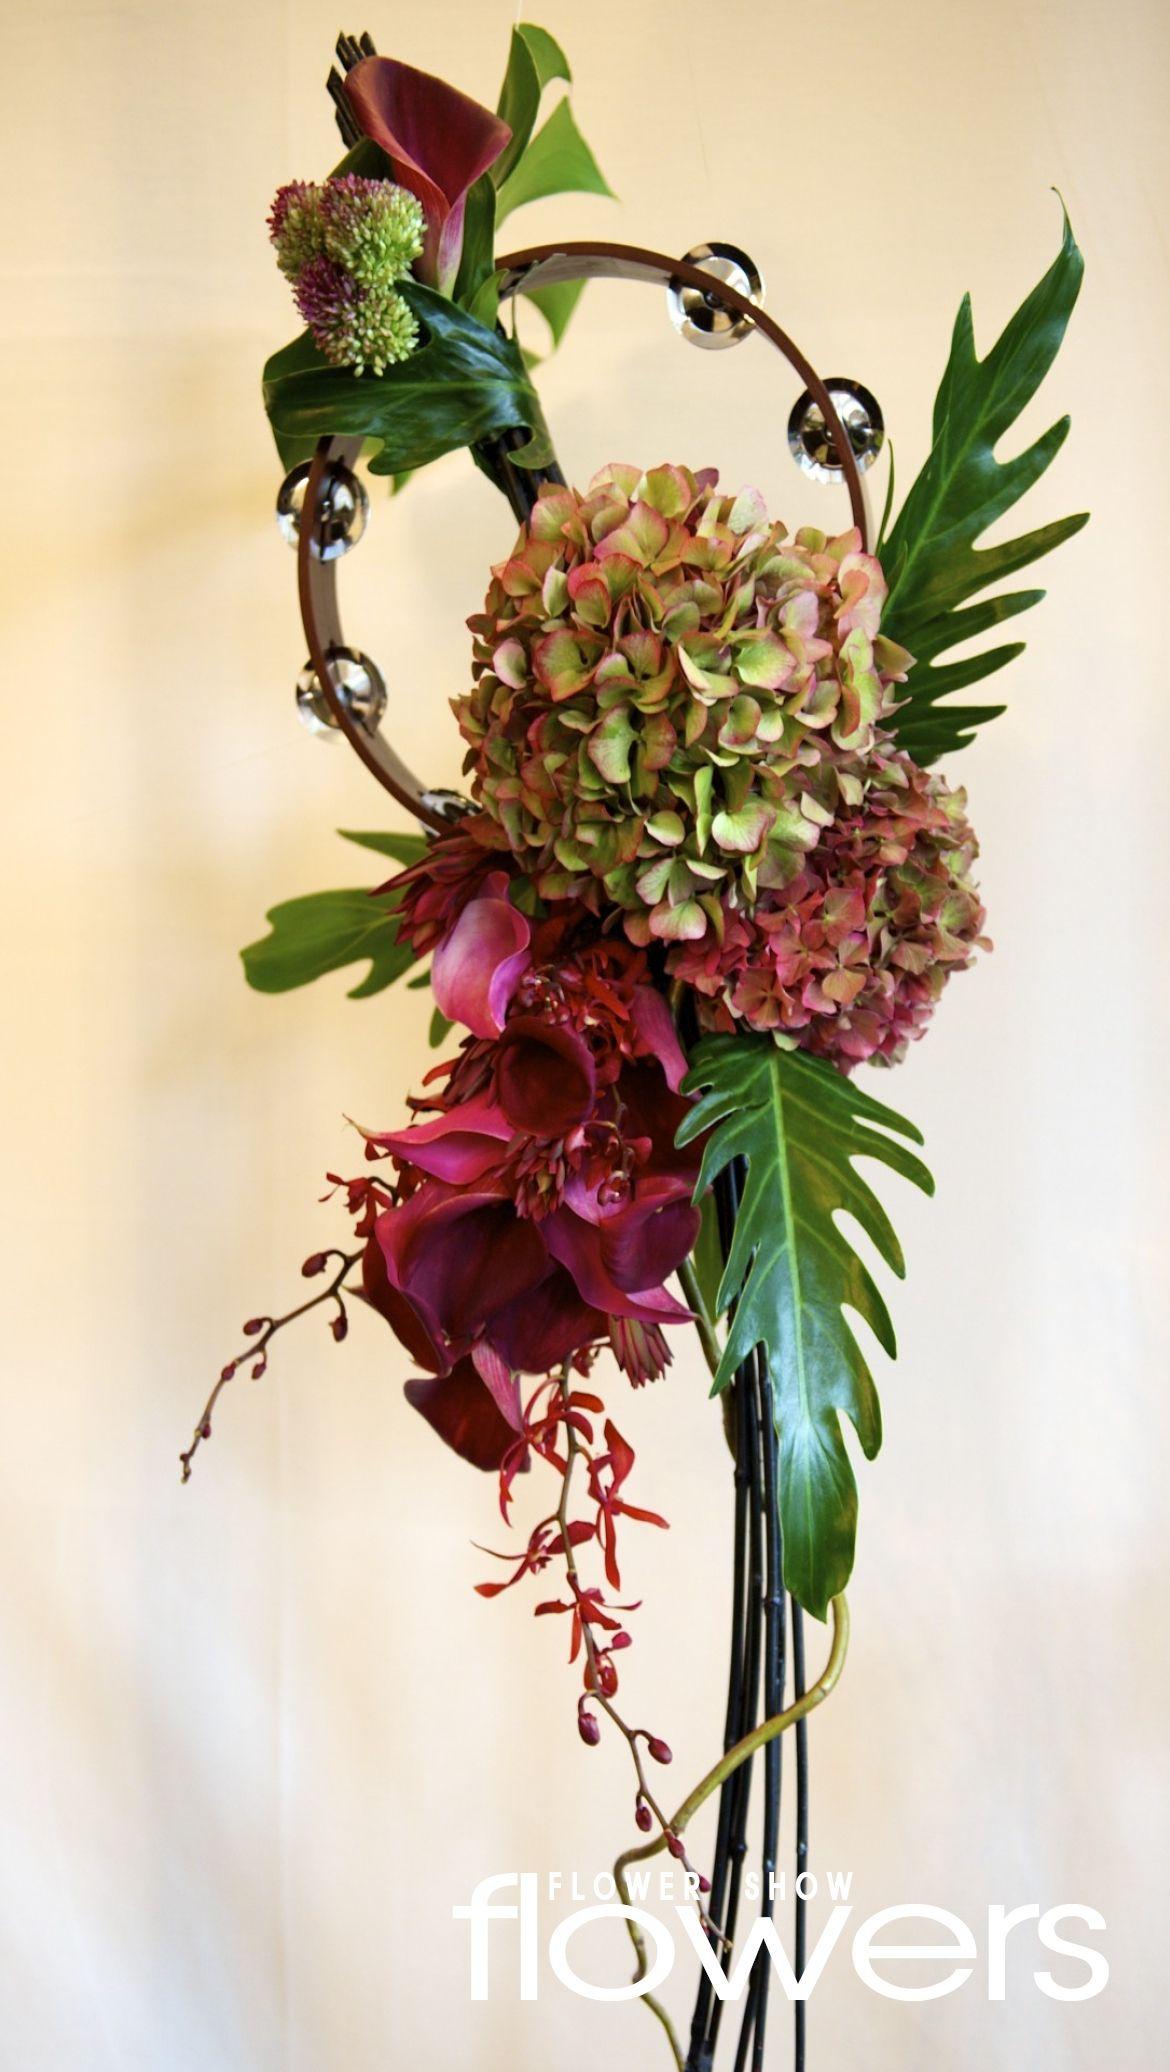 More Floral Designs At Flower Show Flowers Flowershowflowers